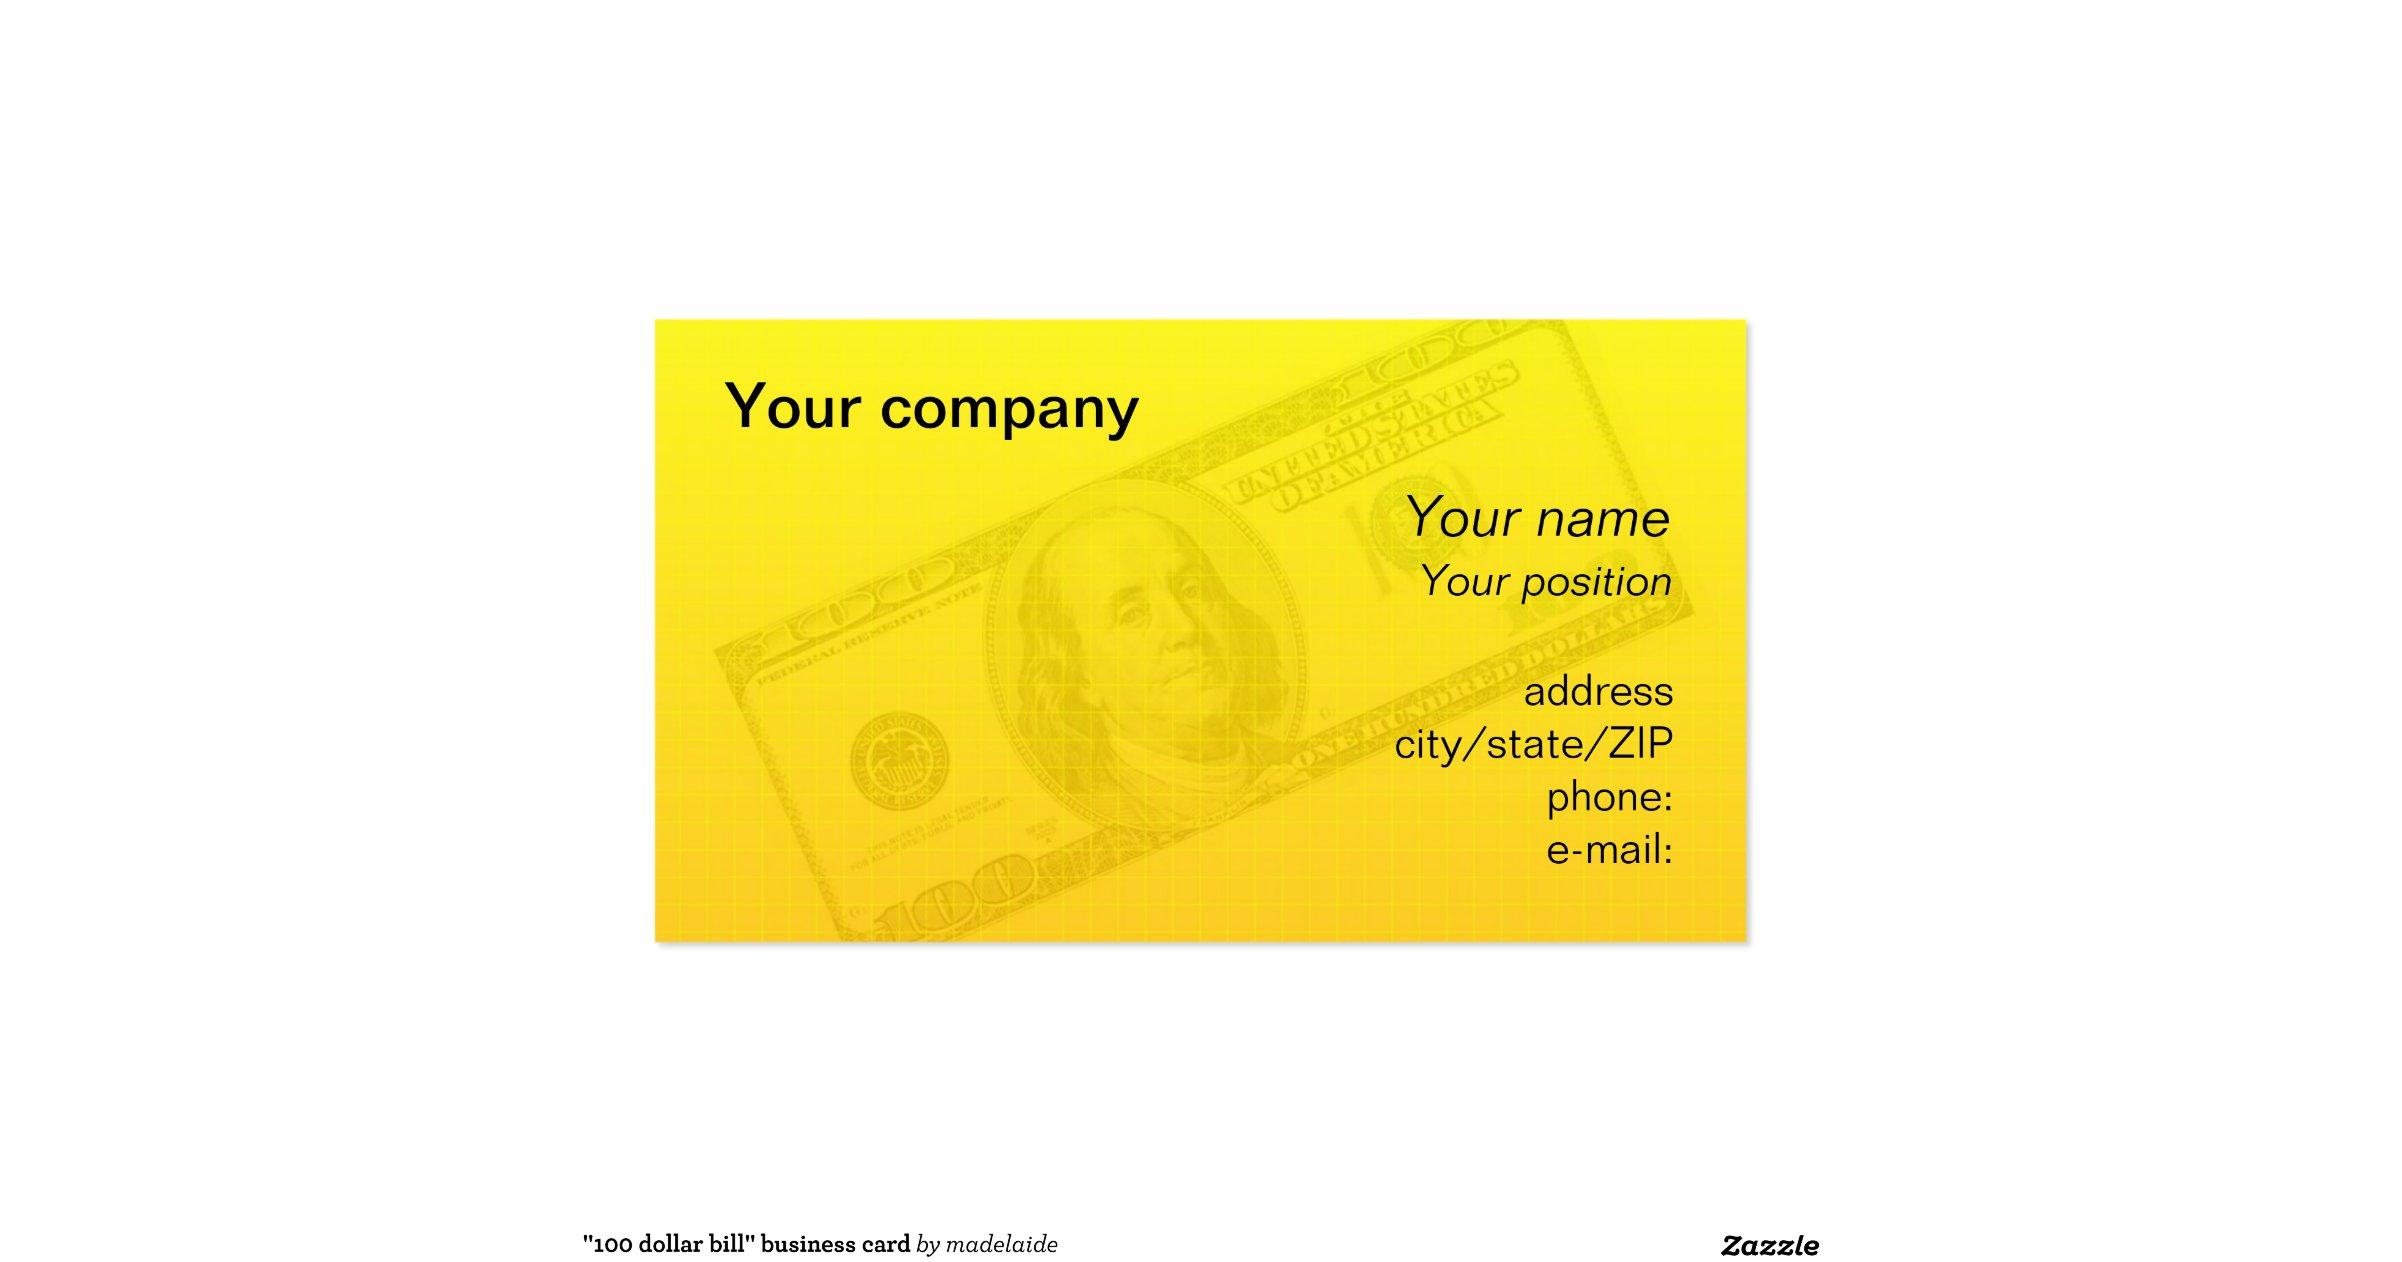 Quot100 dollar billquot business card zazzle for 100 dollar bill business cards